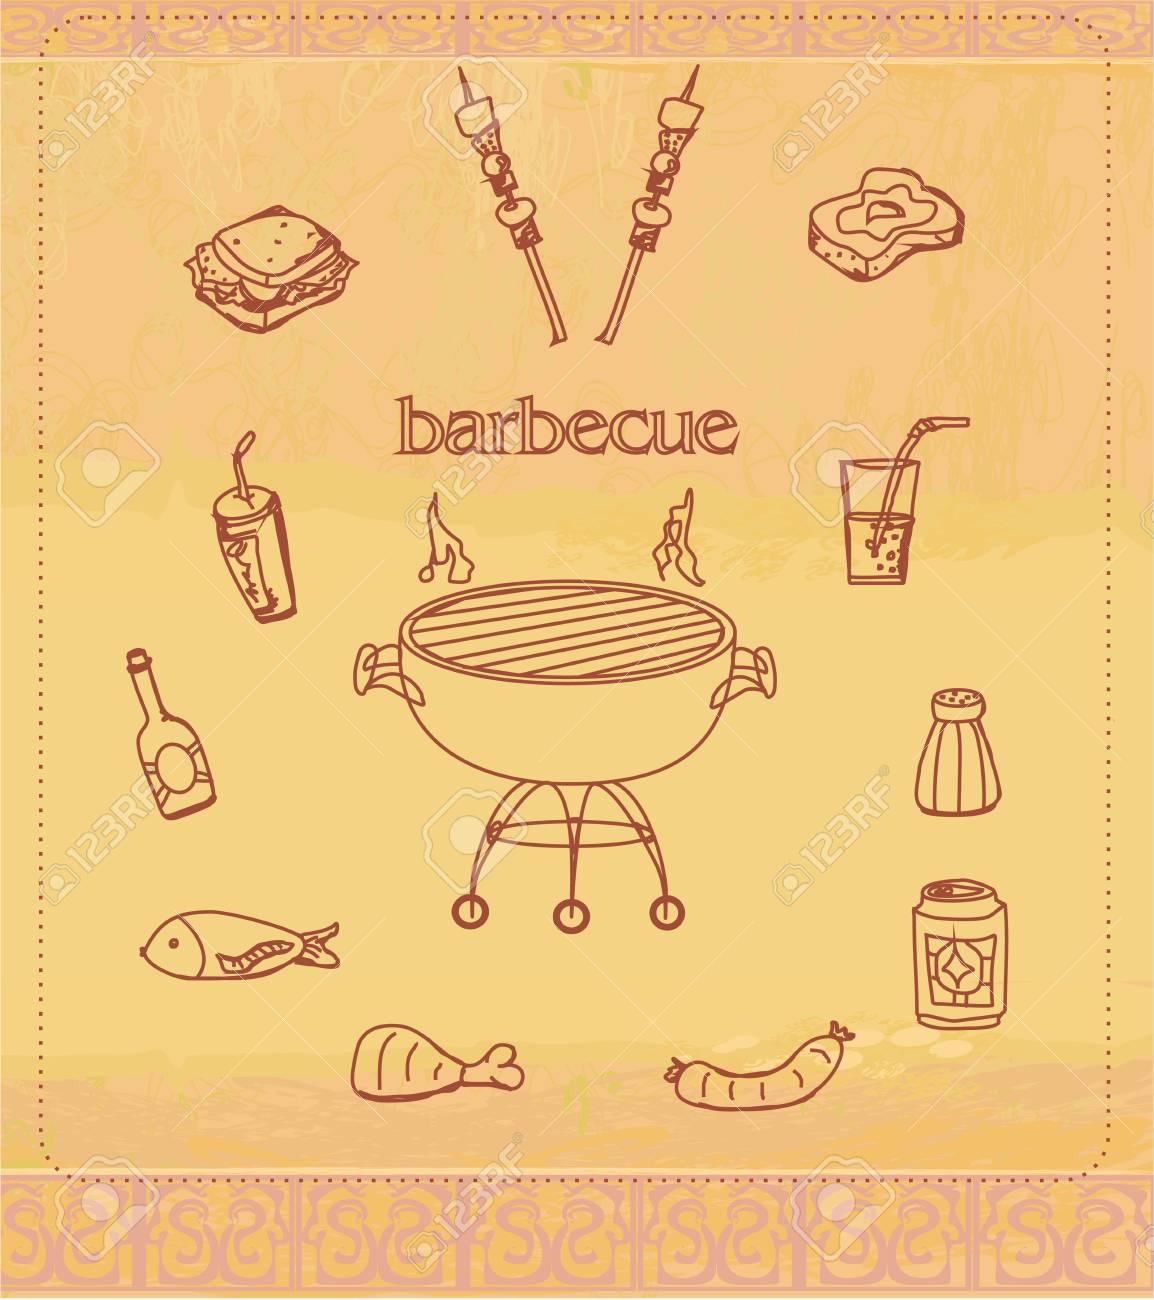 Vintage Barbecue Party Invitation Stock Vector - 17779009